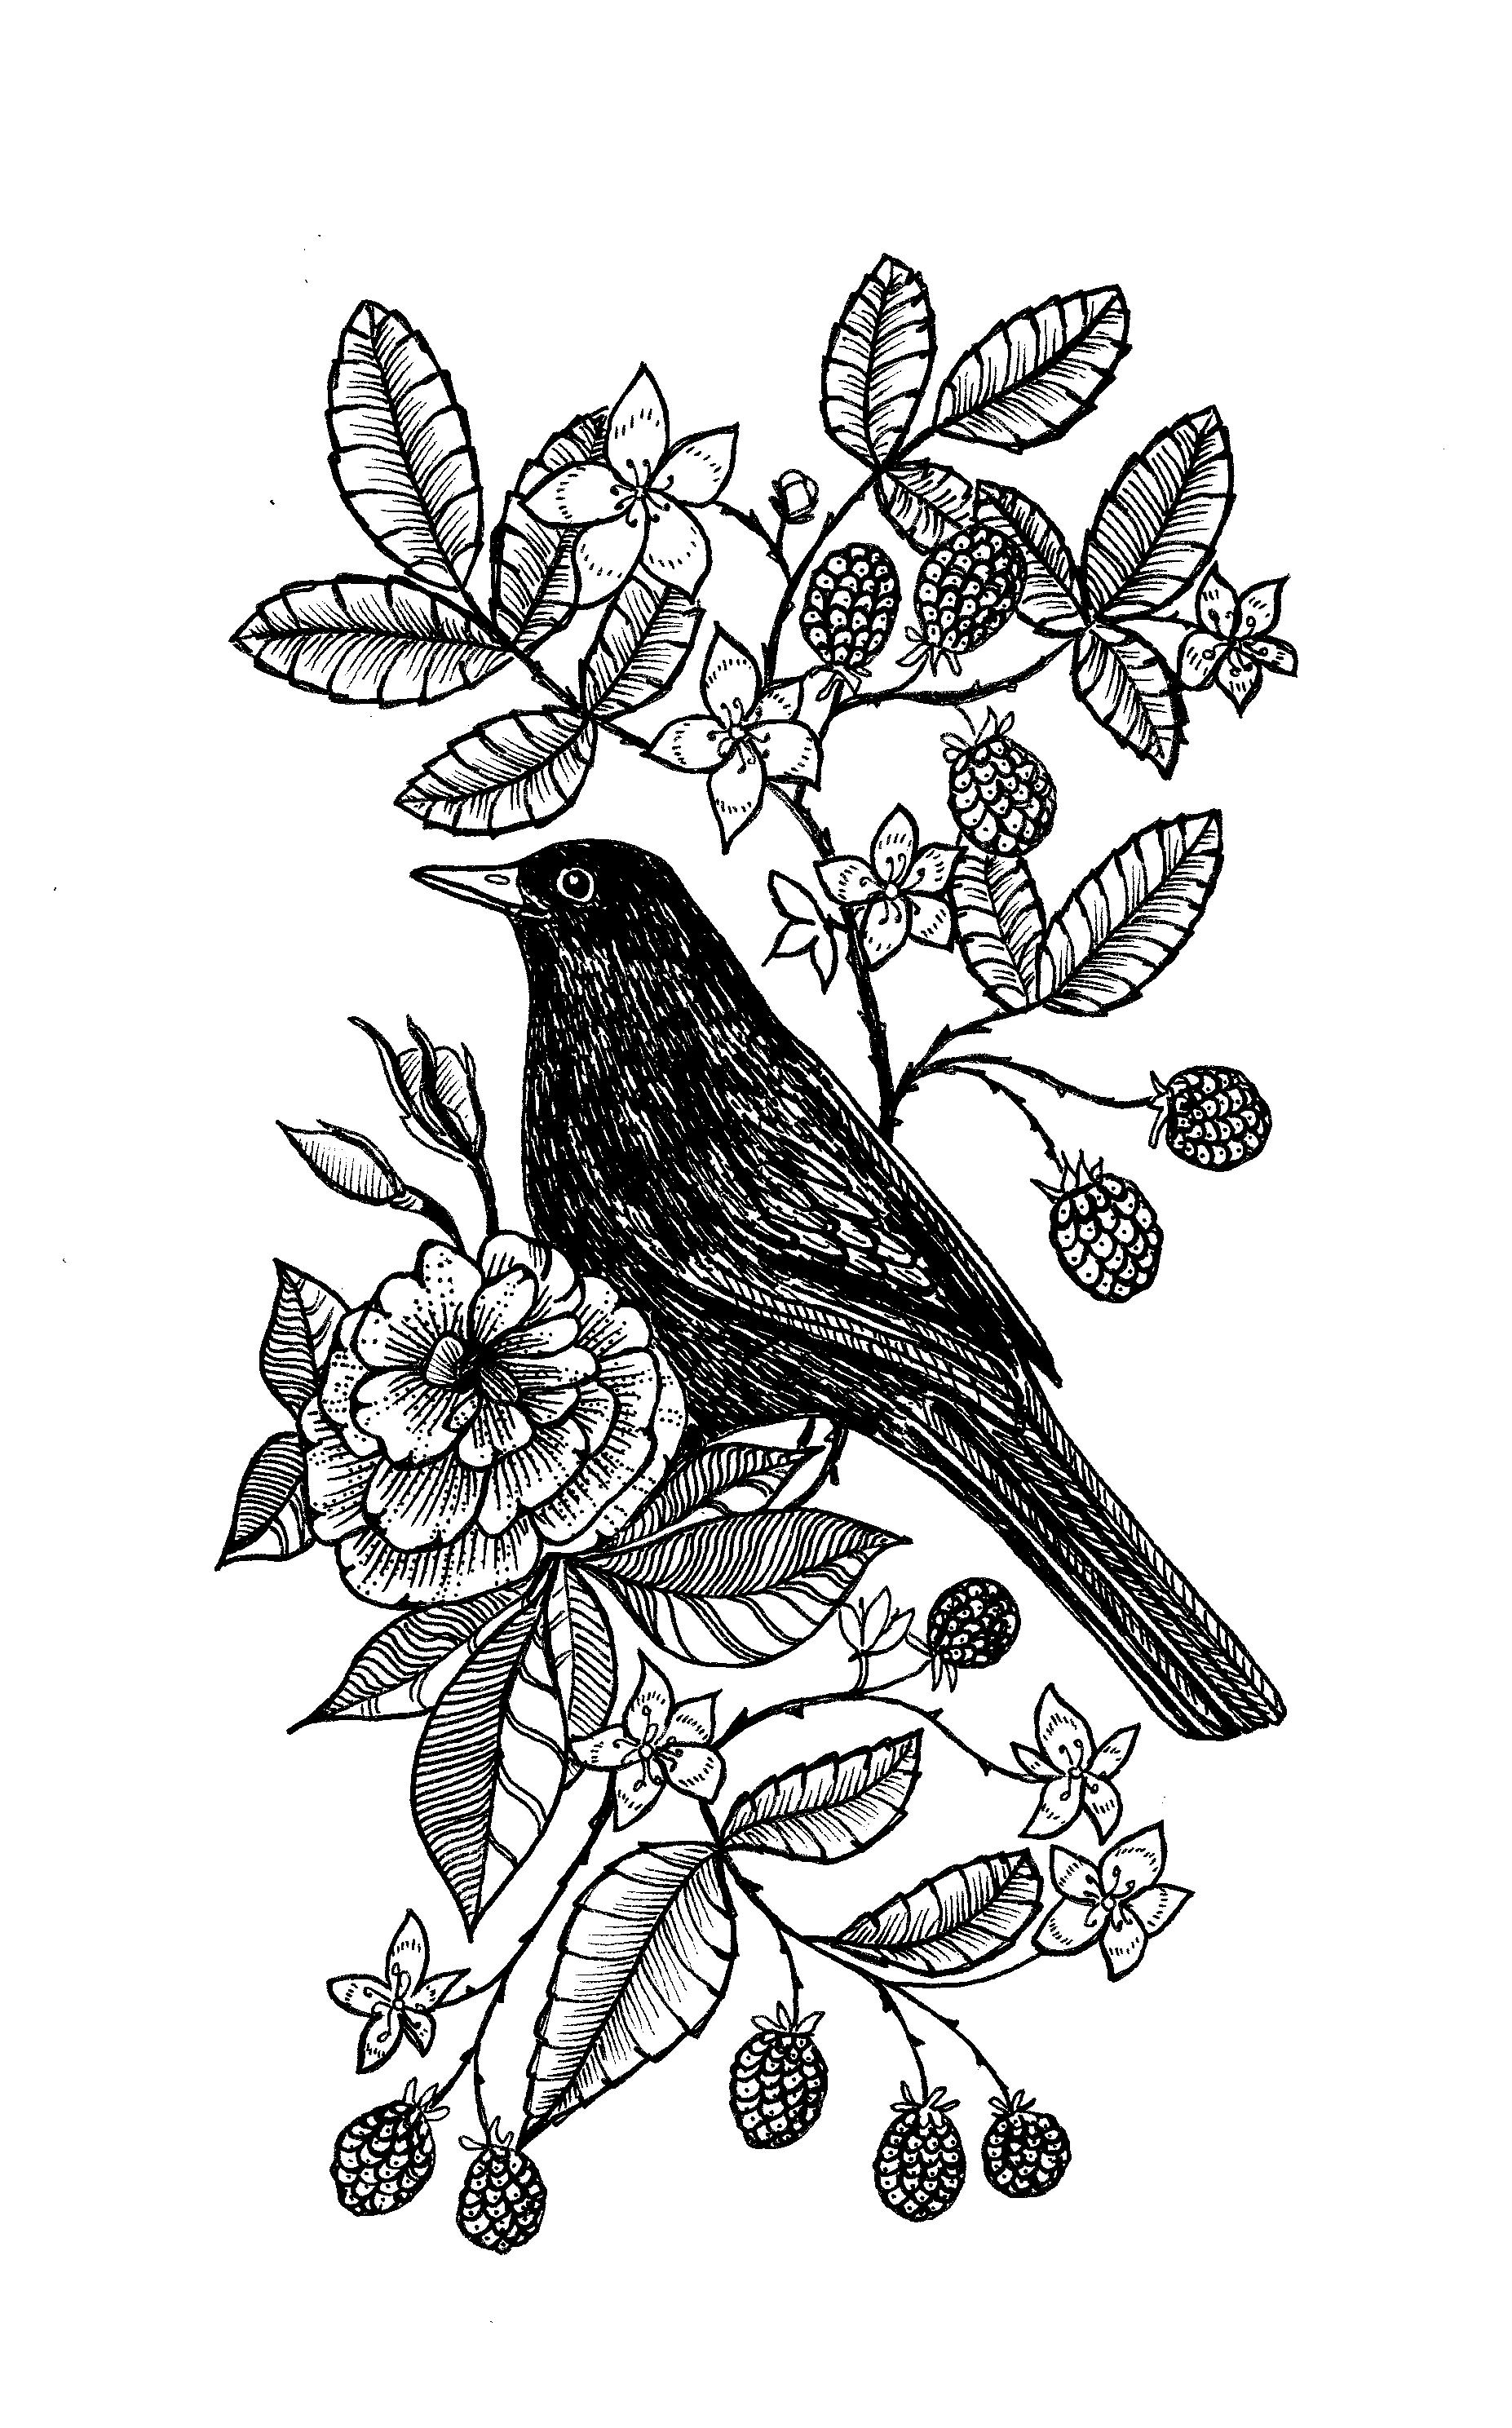 Blackbird and Blackberries Tattoo design 2016.